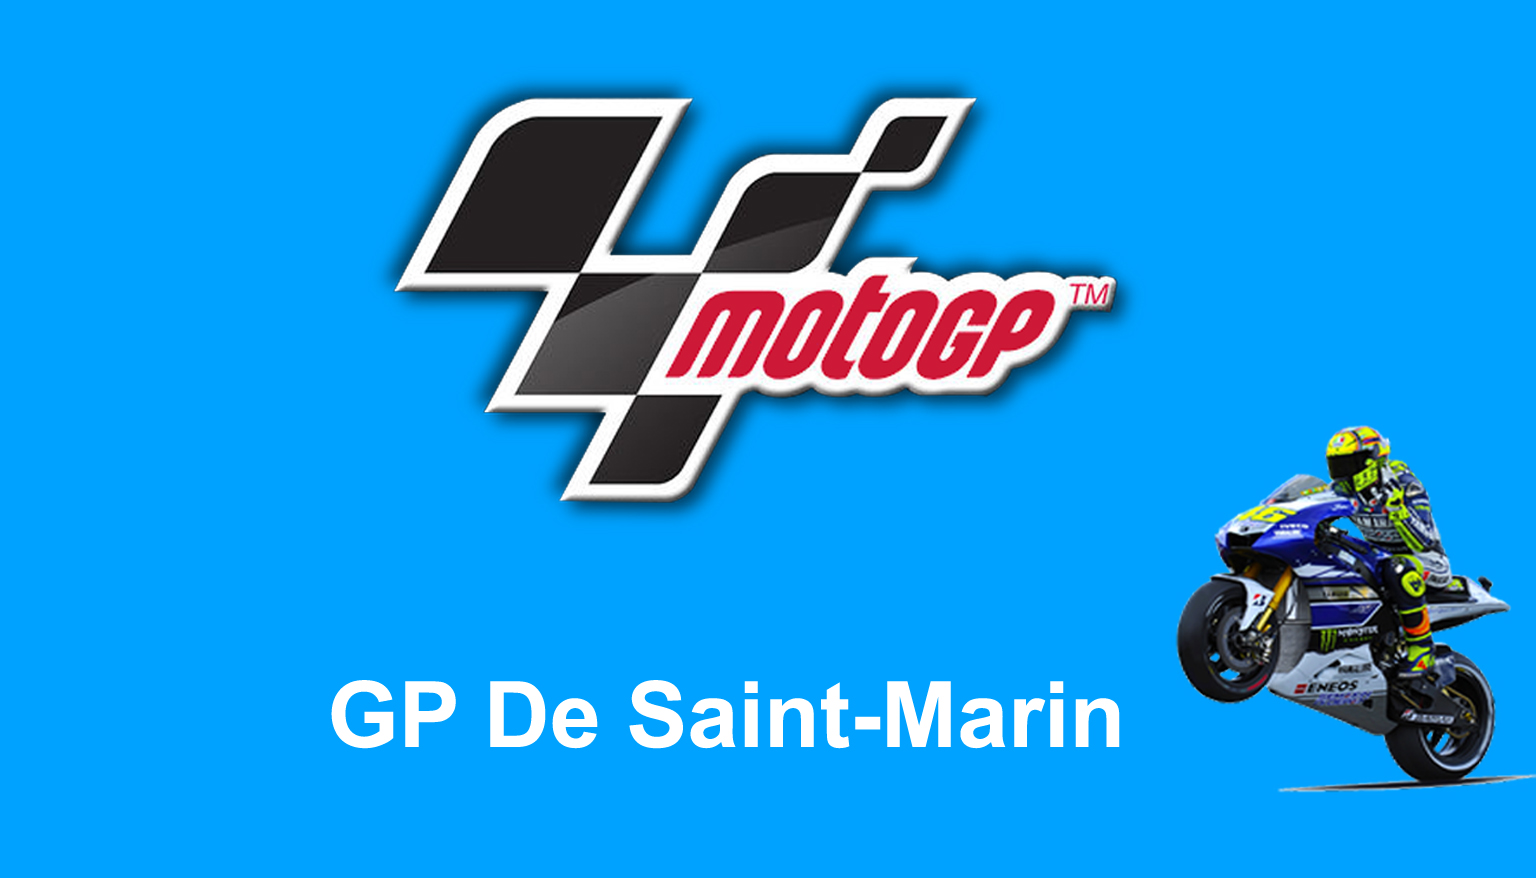 GP De Saint-Marin